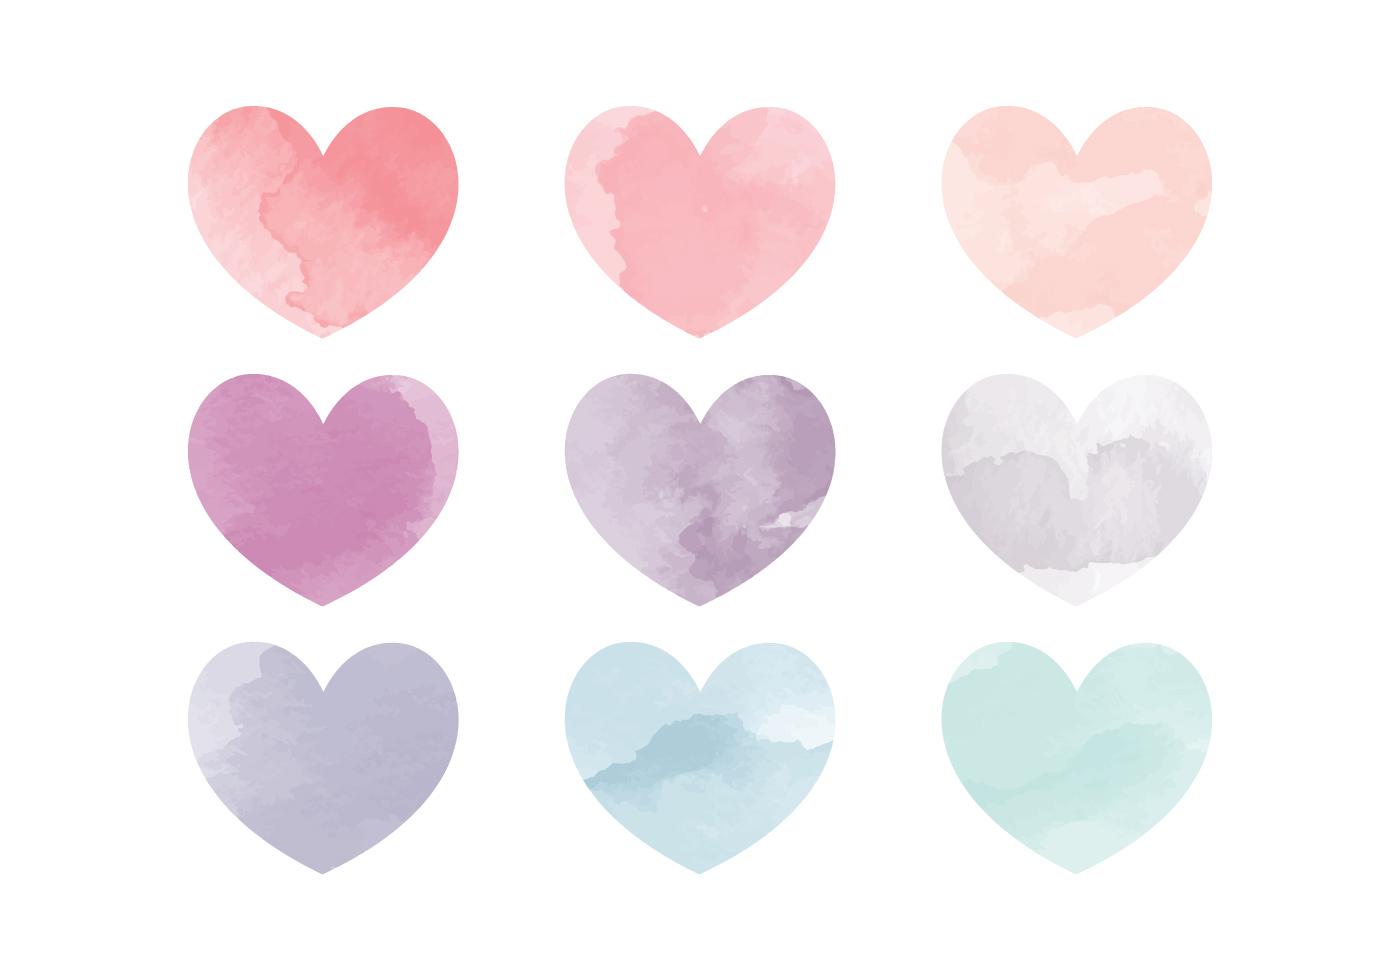 Vector Watercolor Hearts - Download Free Vector Art, Stock ...